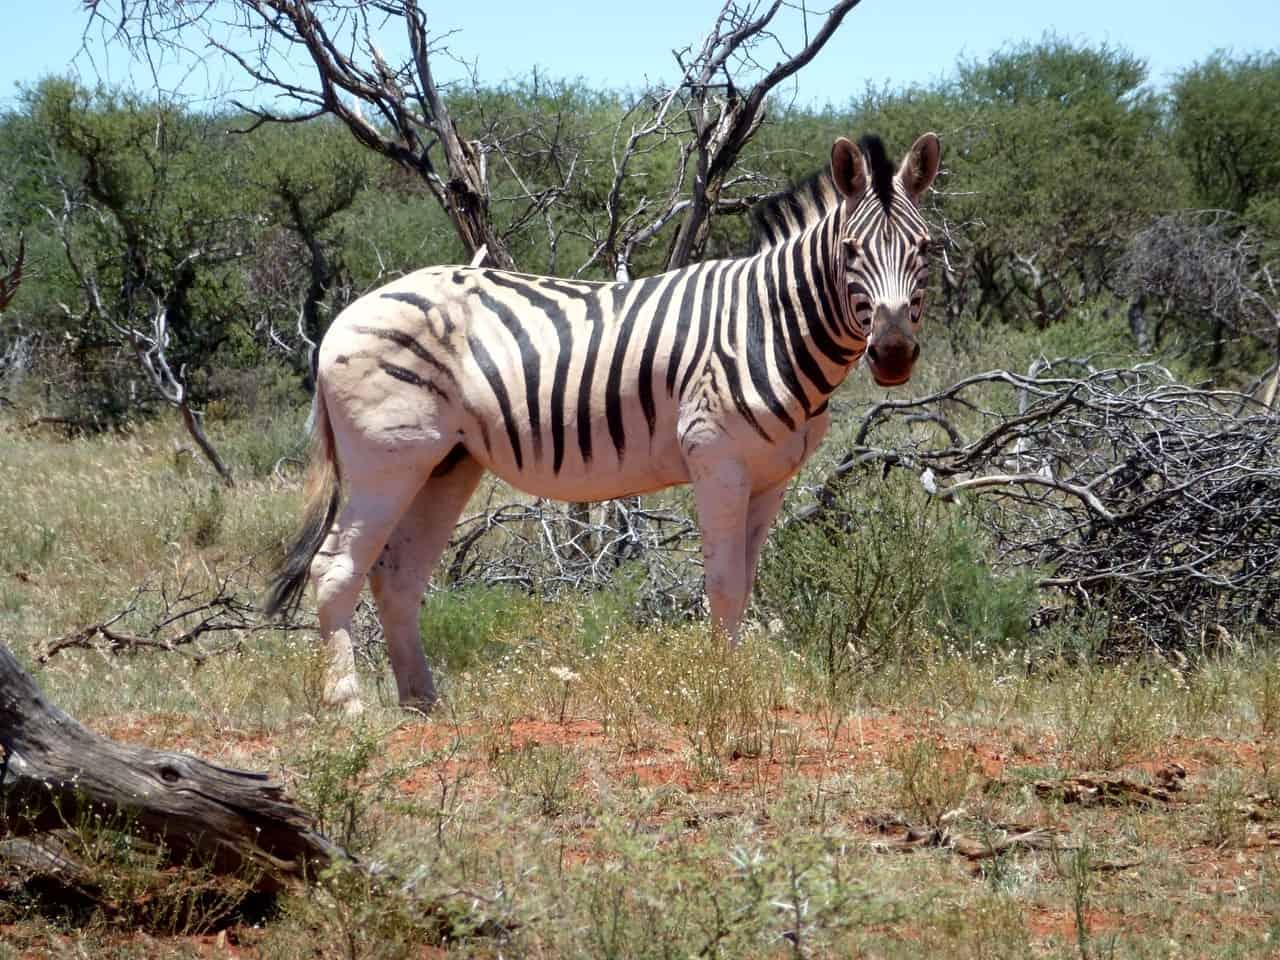 zebra near log and bush